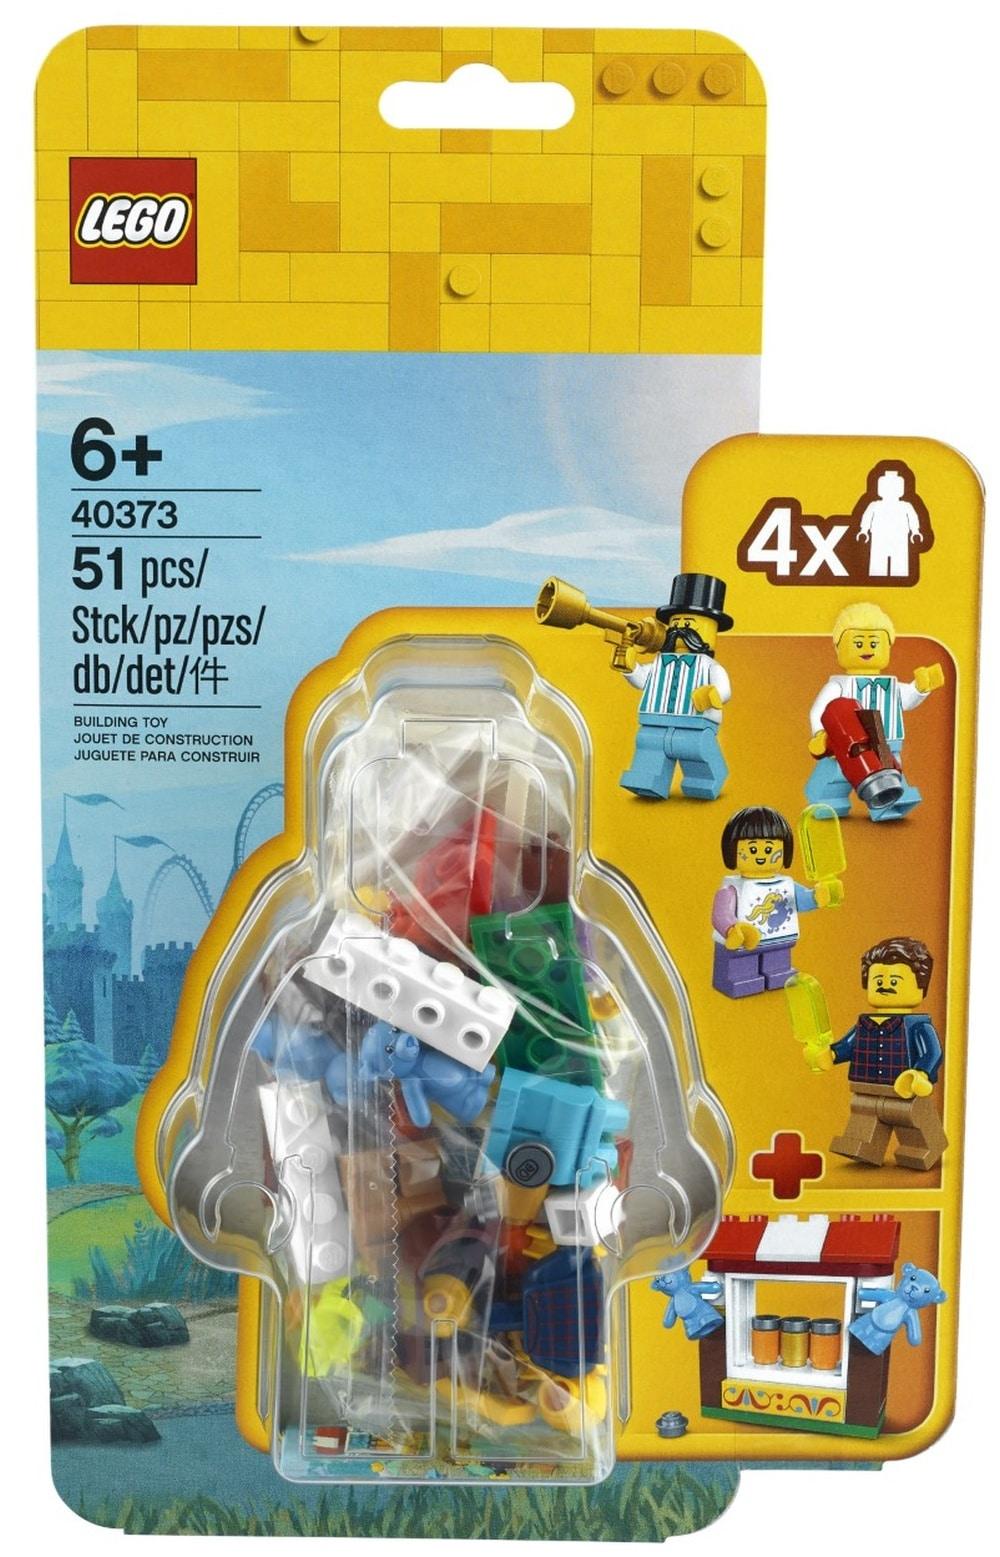 LEGO 40373 Minifigurenset